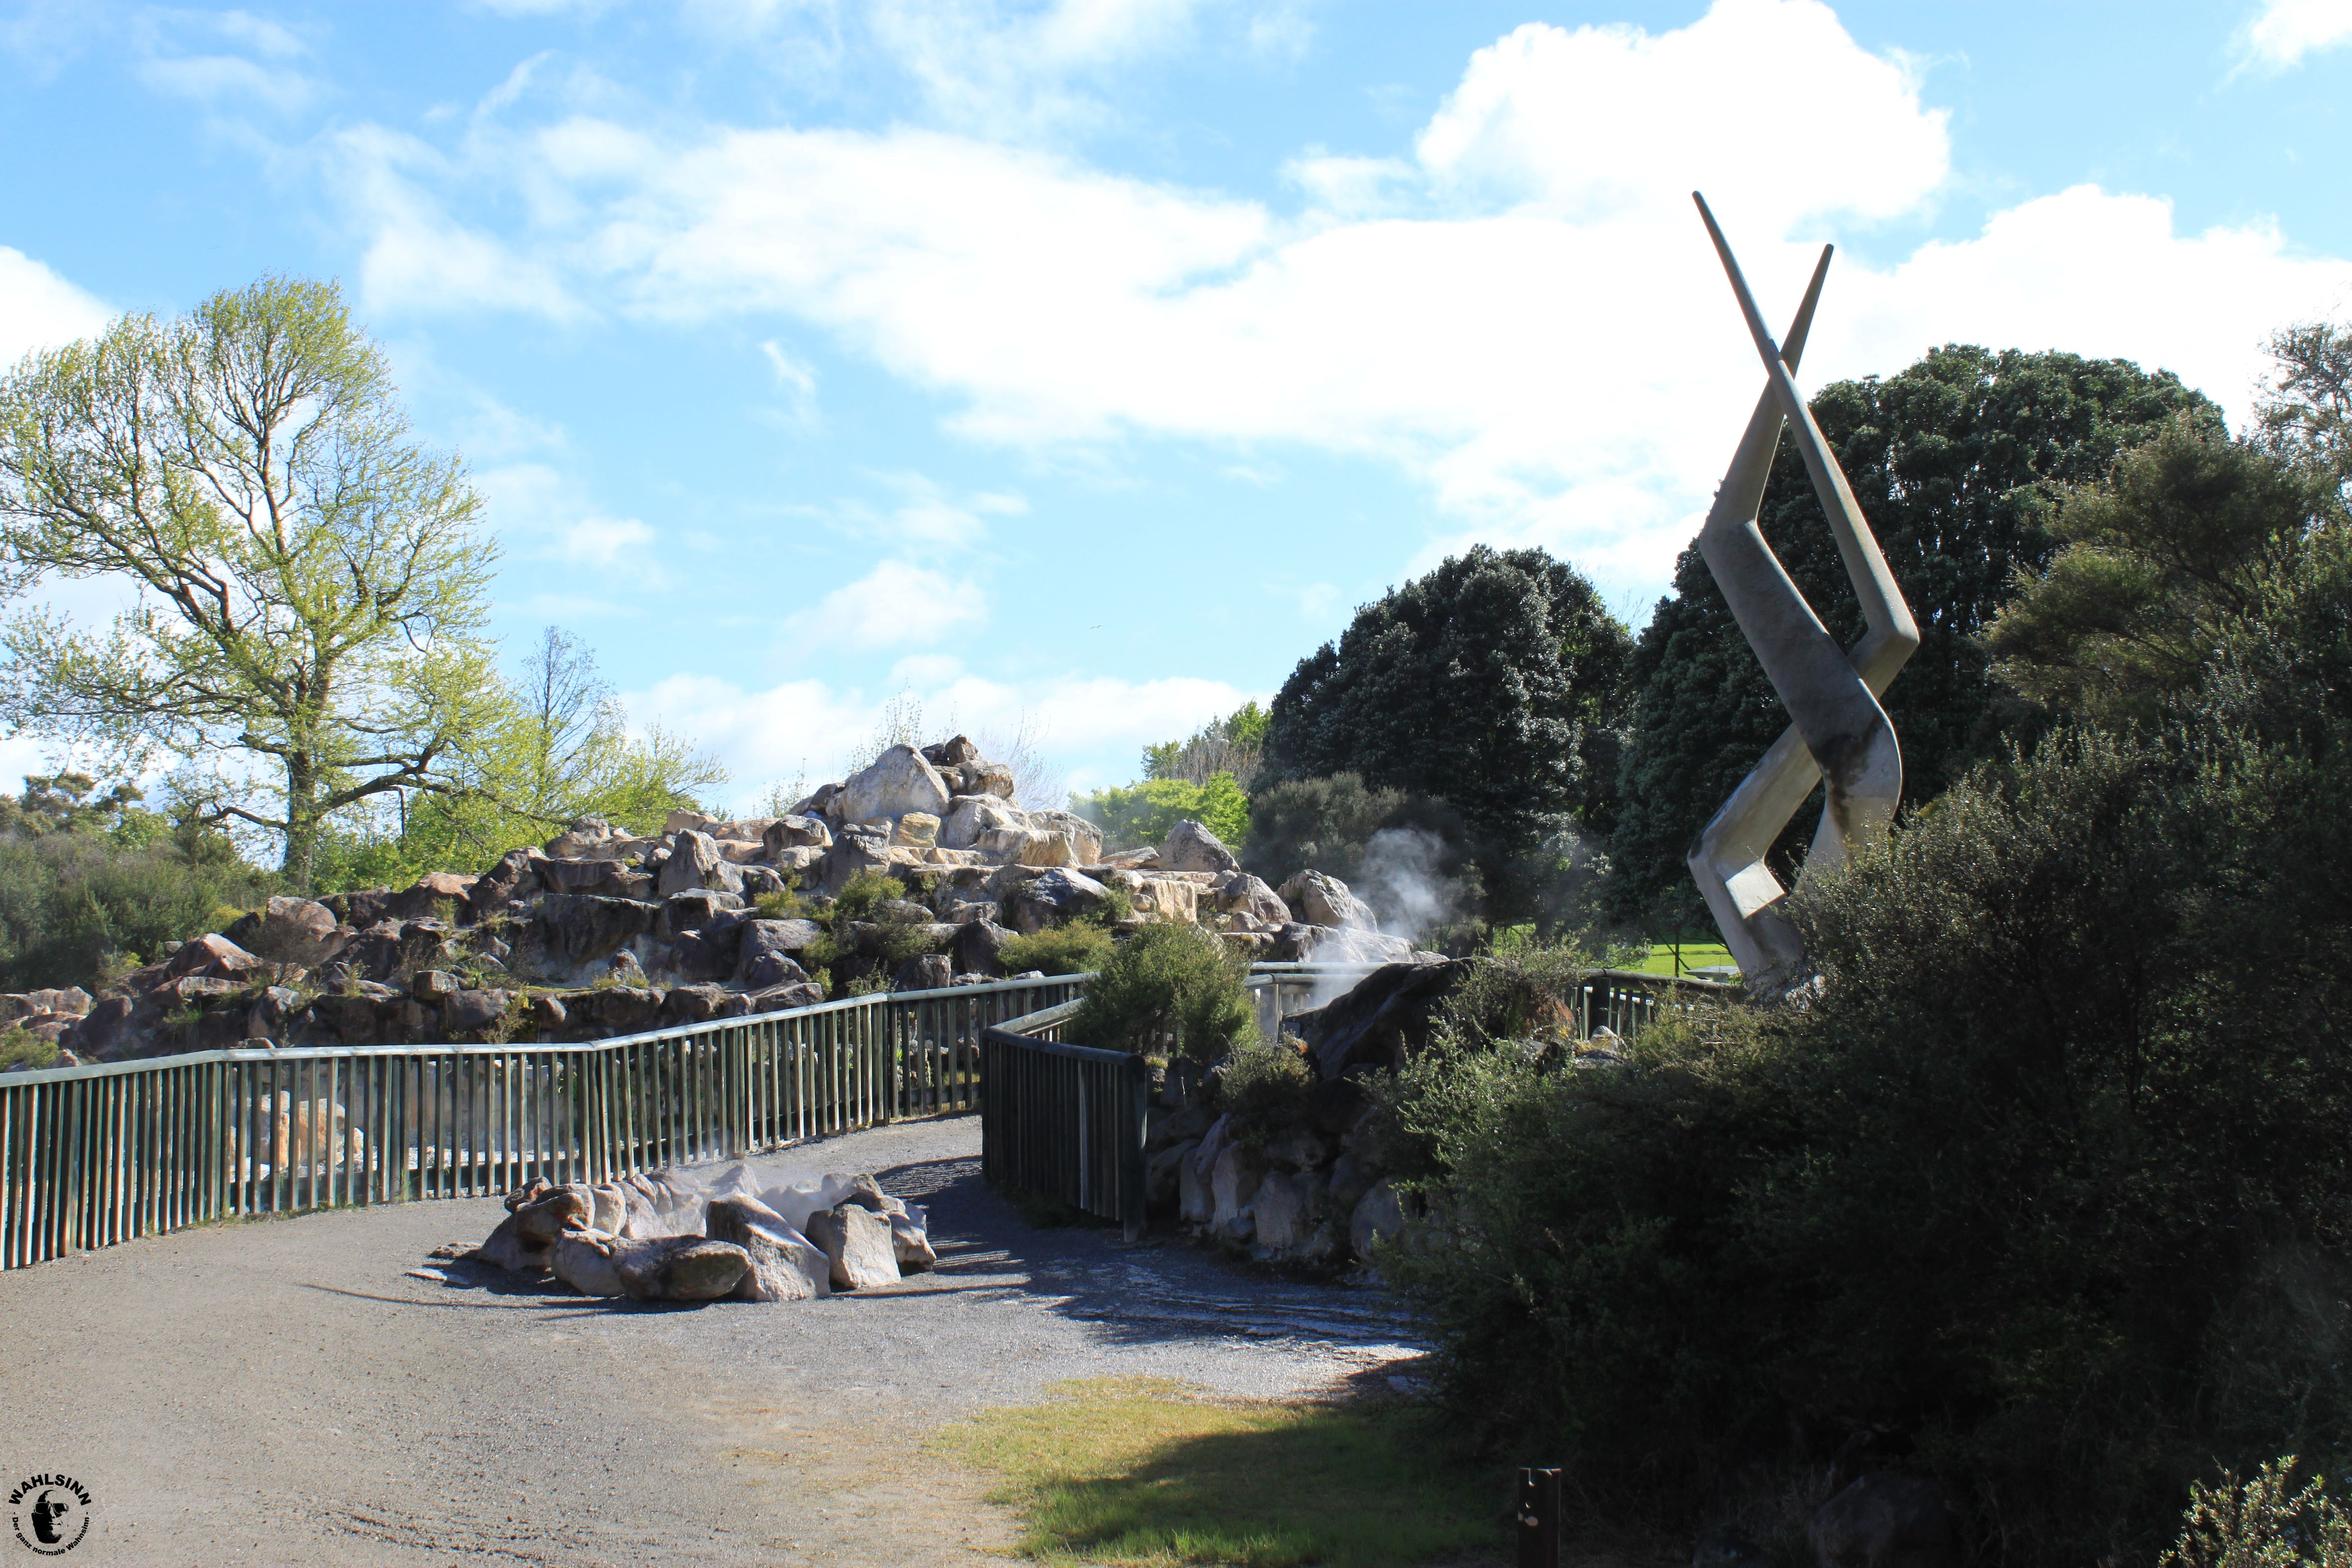 Rotorua (Neuseeland) - Ein Parl voller Löcher aus denen Erdwärme austritt